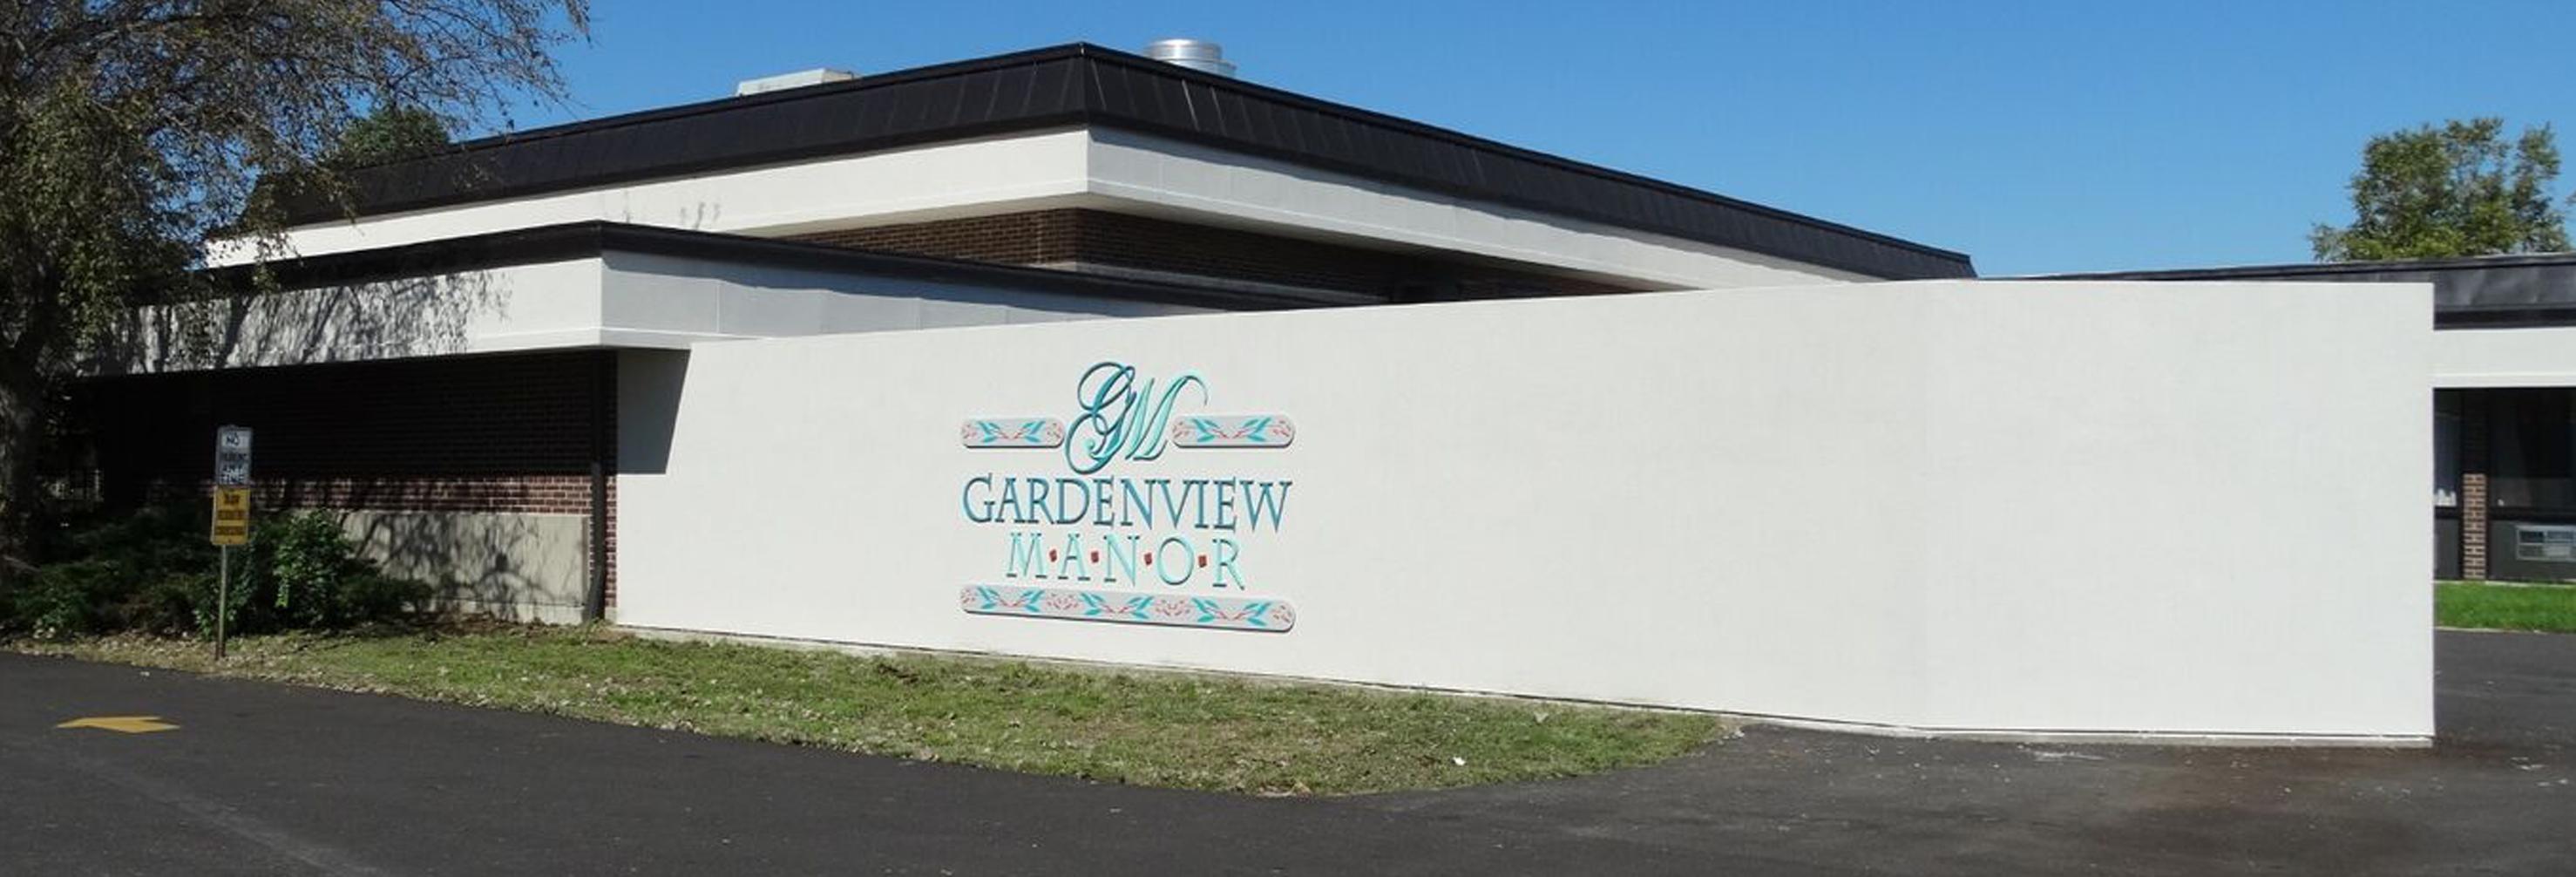 gardenview manor - Garden View